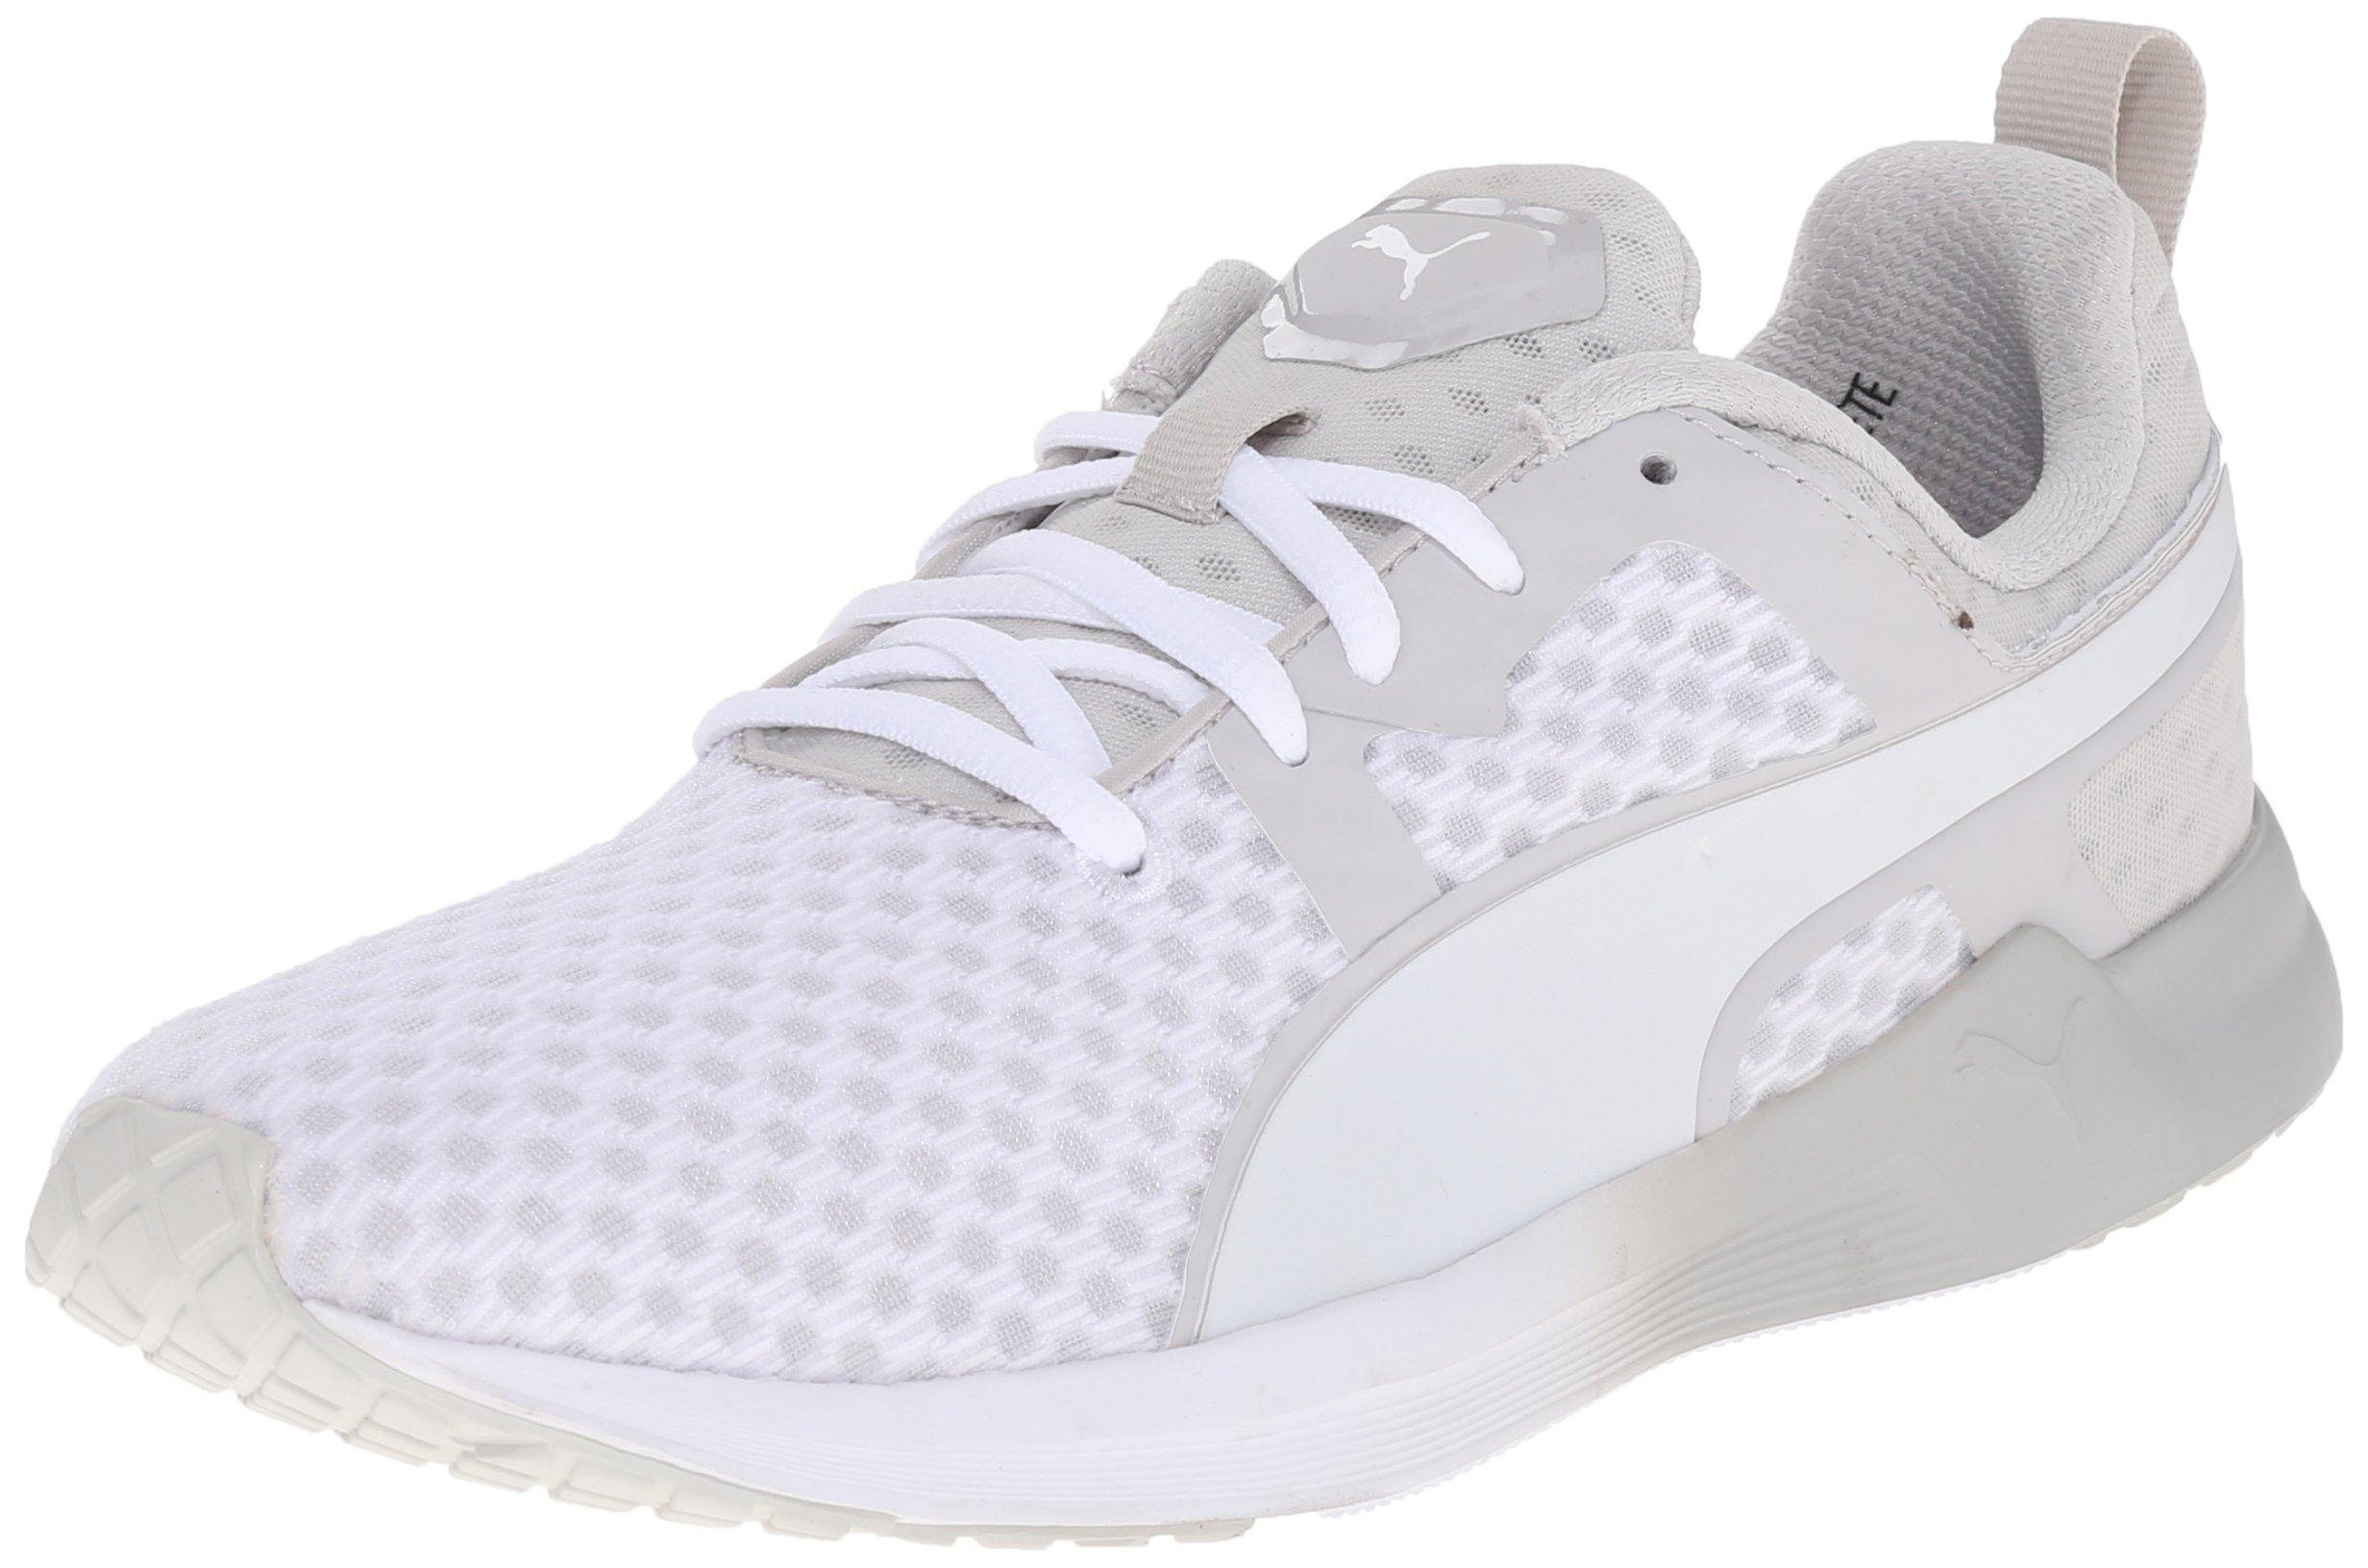 PUMA Women's Pulse XT Core Running Sneaker, White Gray Violet, 7.5 B US